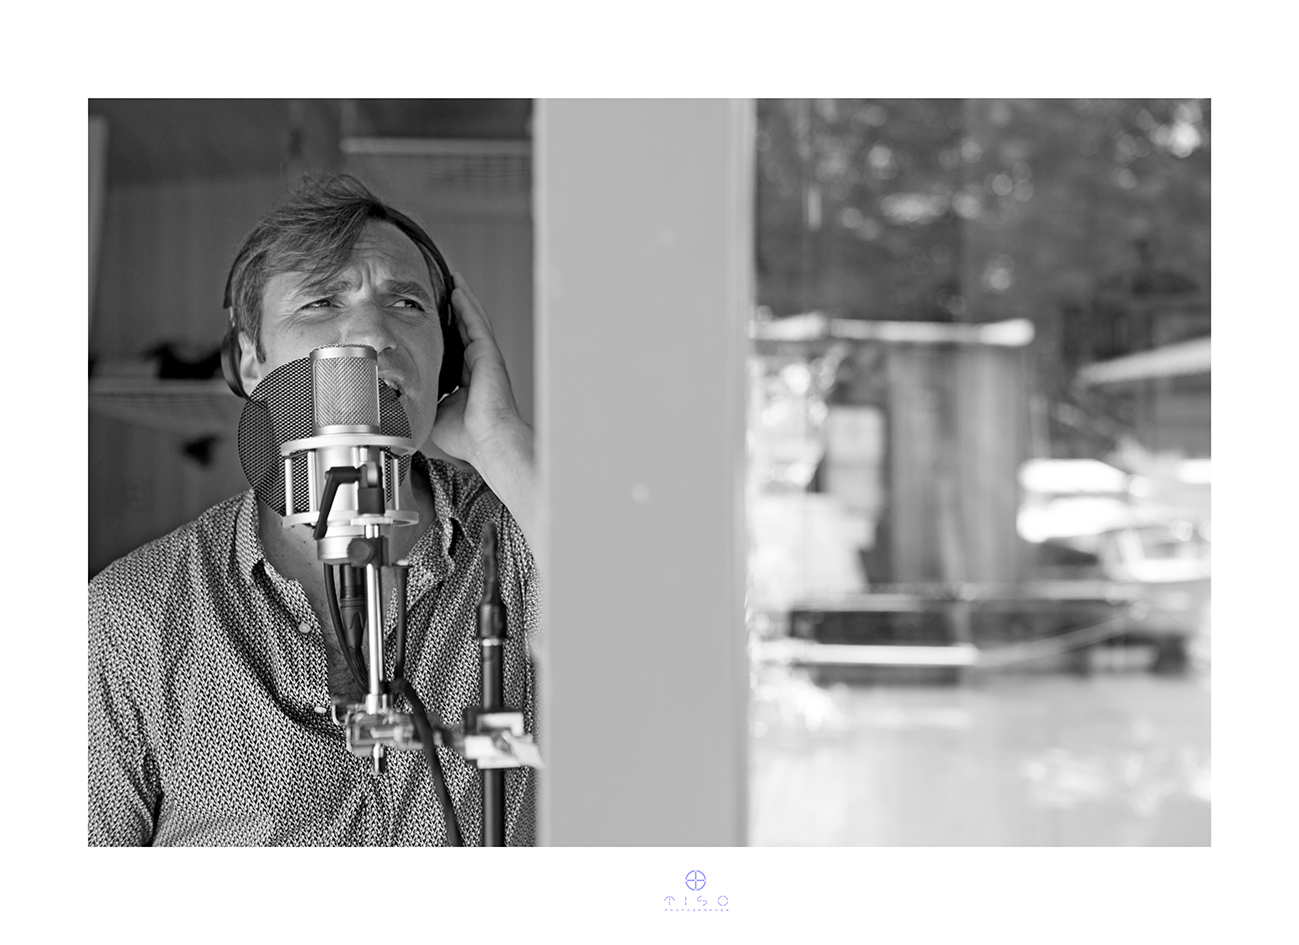 MIG21-JIRKA-PRAHA-6-2014-TISOPHOTO-1996-OK small